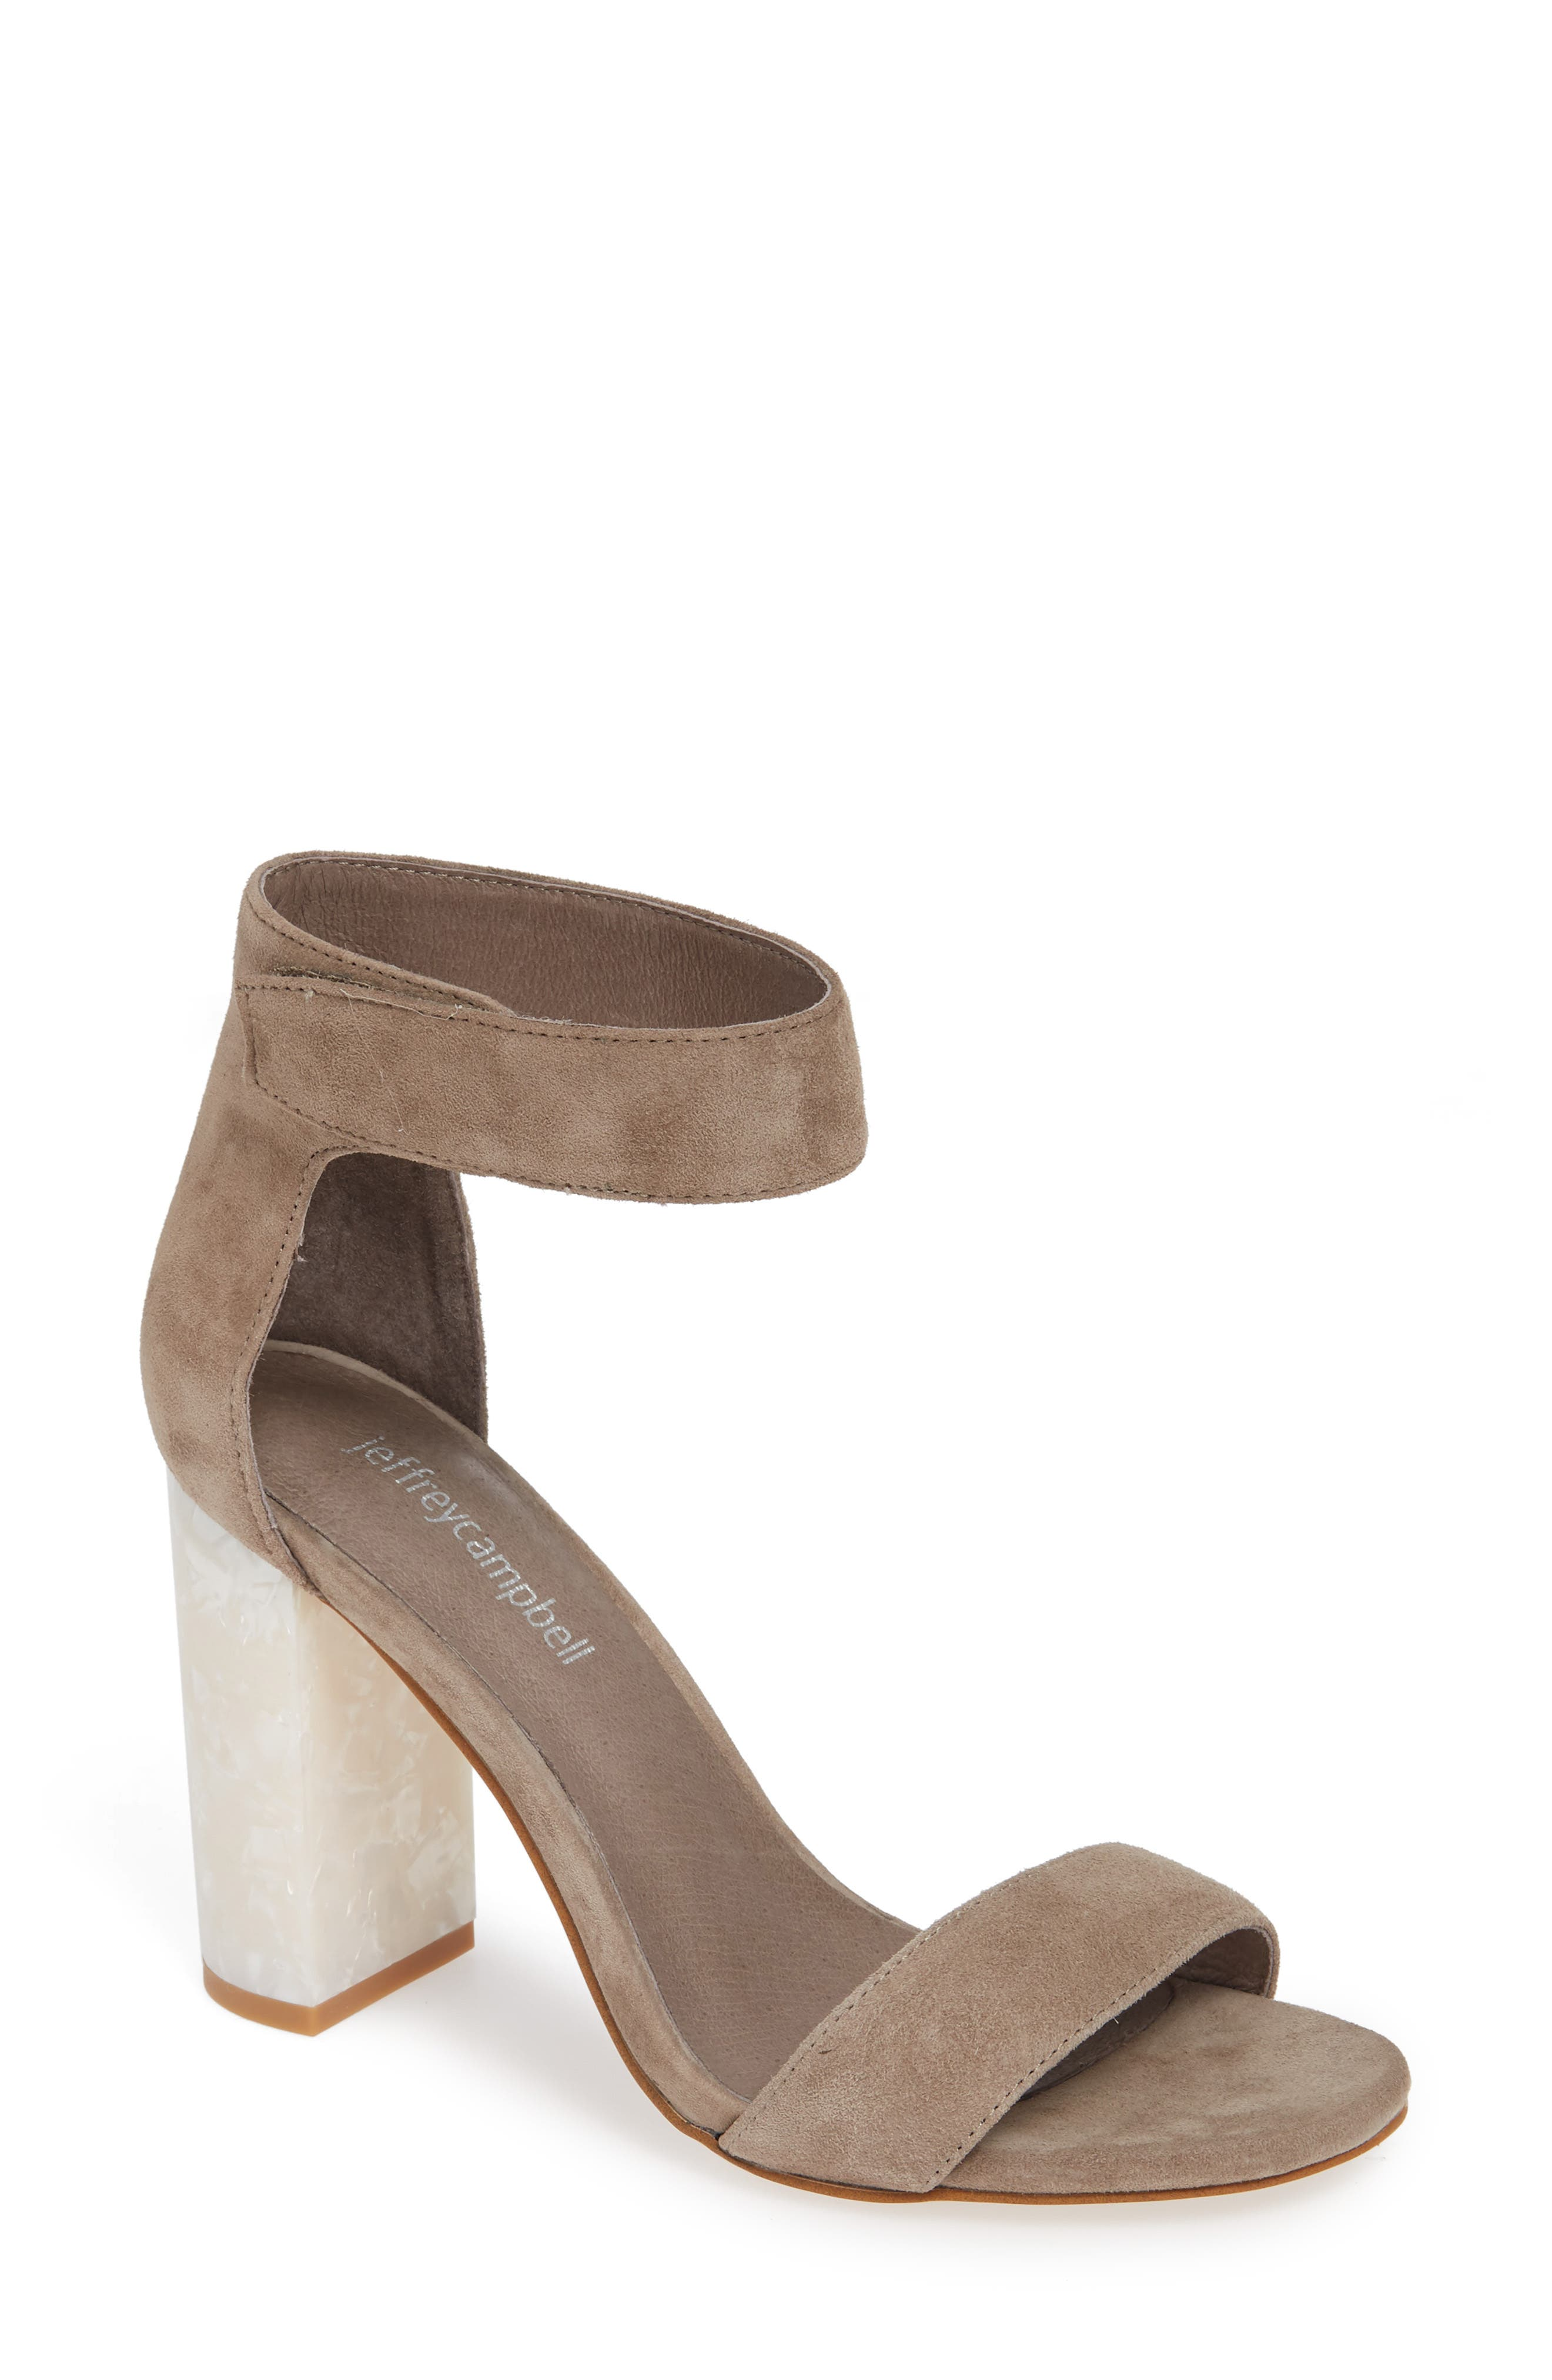 Lindsay Statement Heel Sandal,                         Main,                         color, TAUPE SUEDE